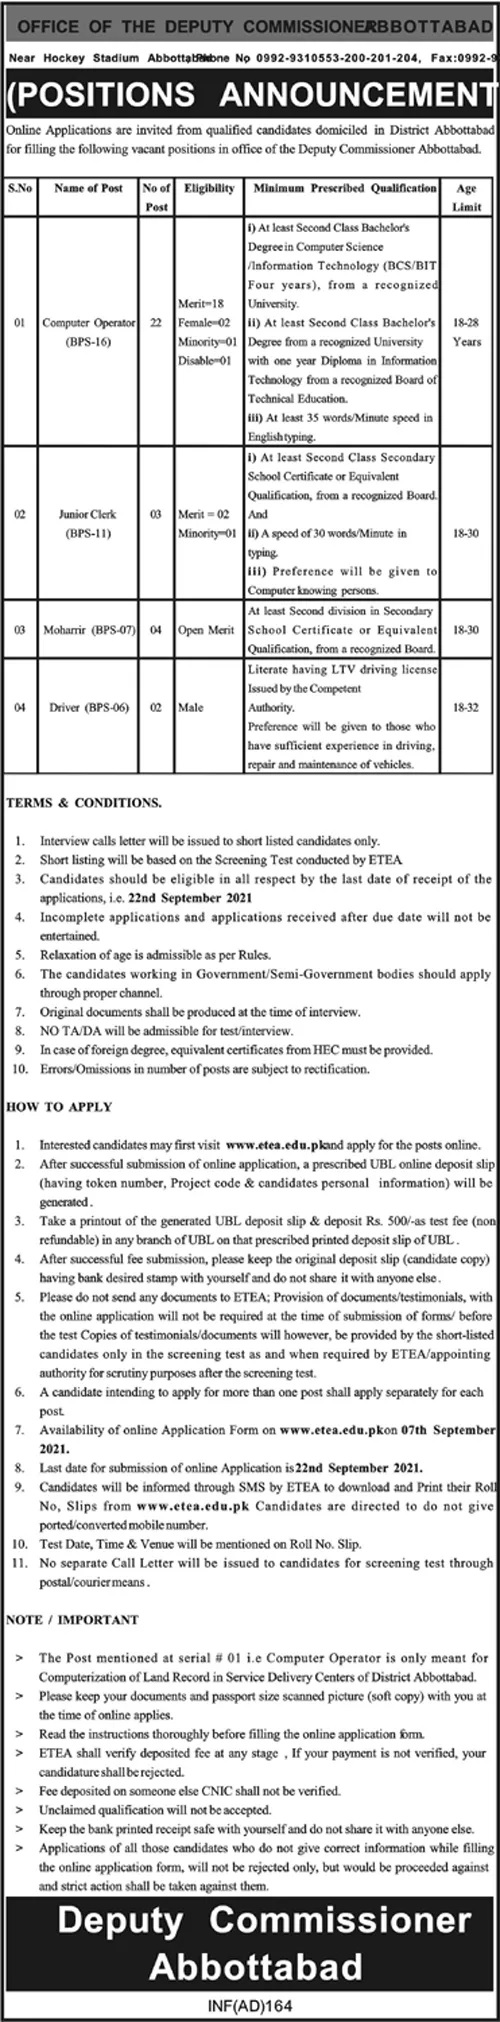 Deputy Commissioner Office Abbottabad ETEA Jobs 2021